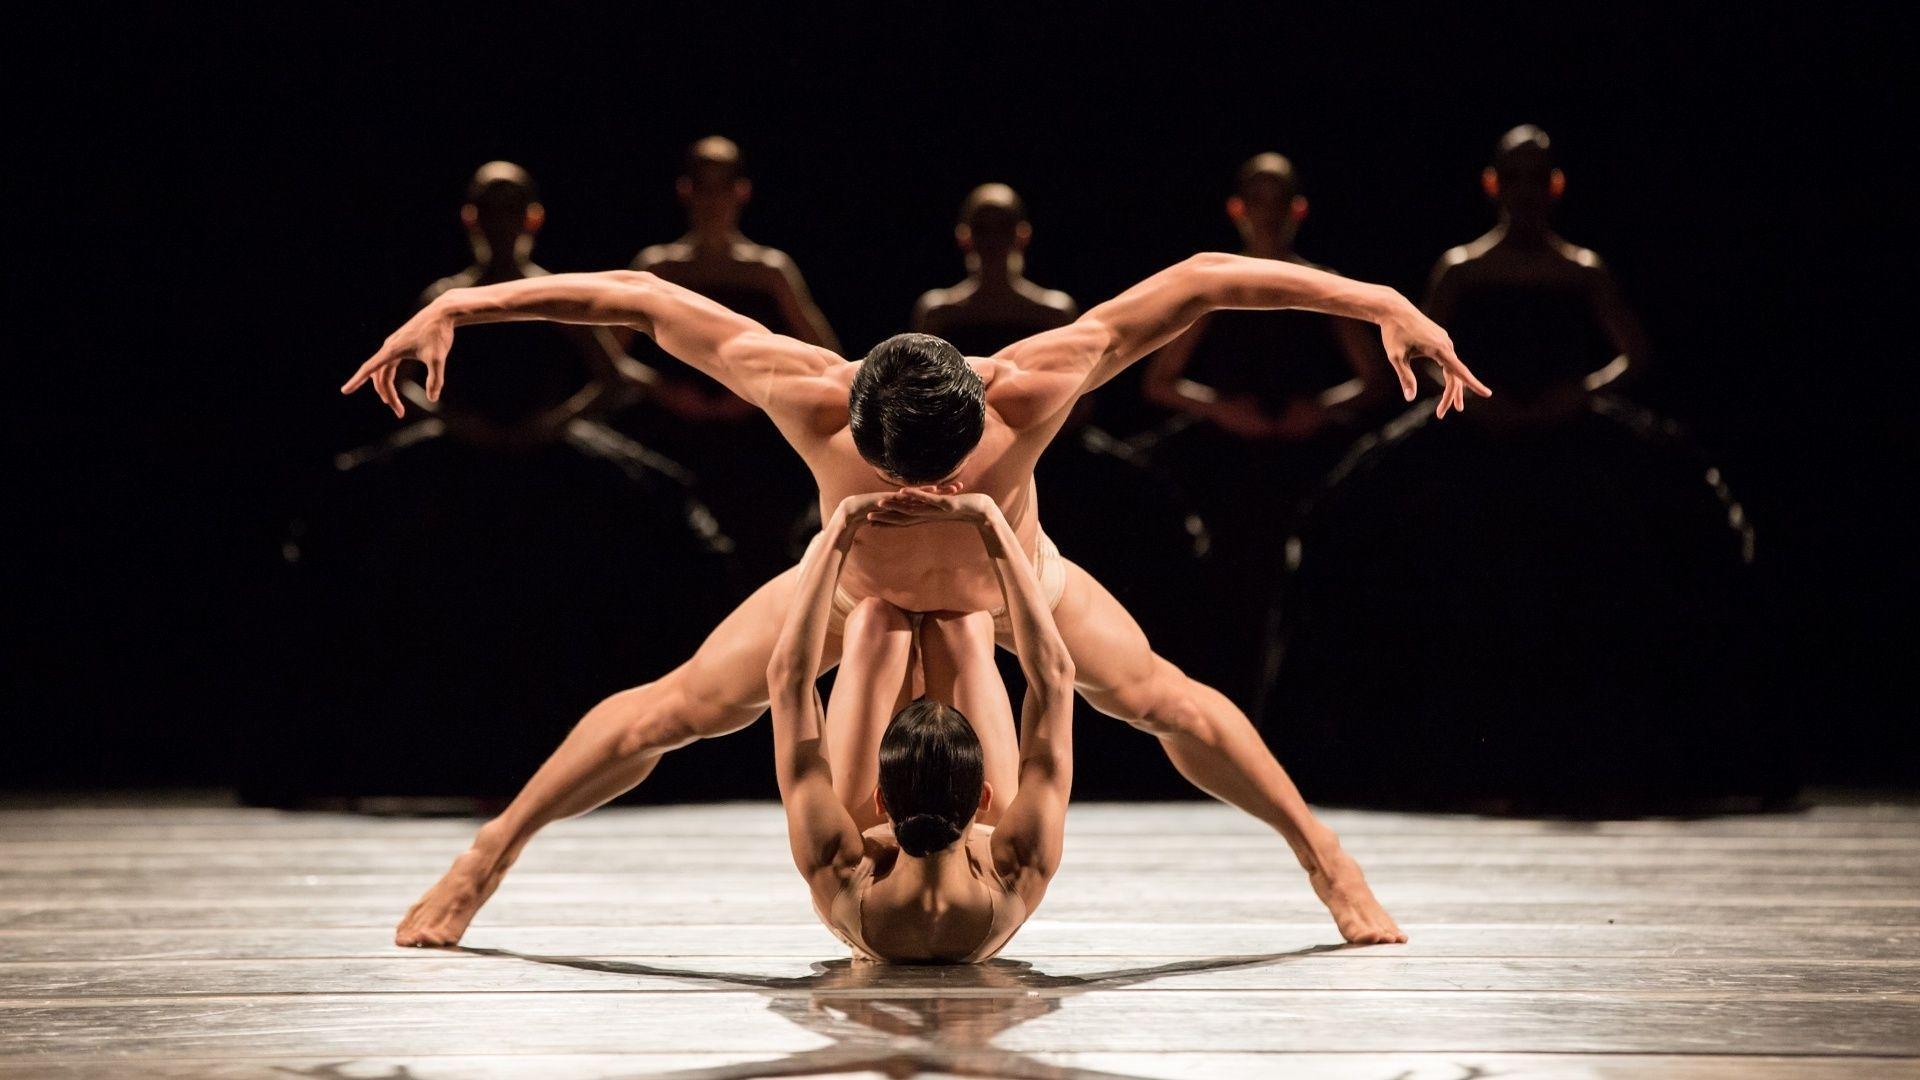 танцы голые артисты все